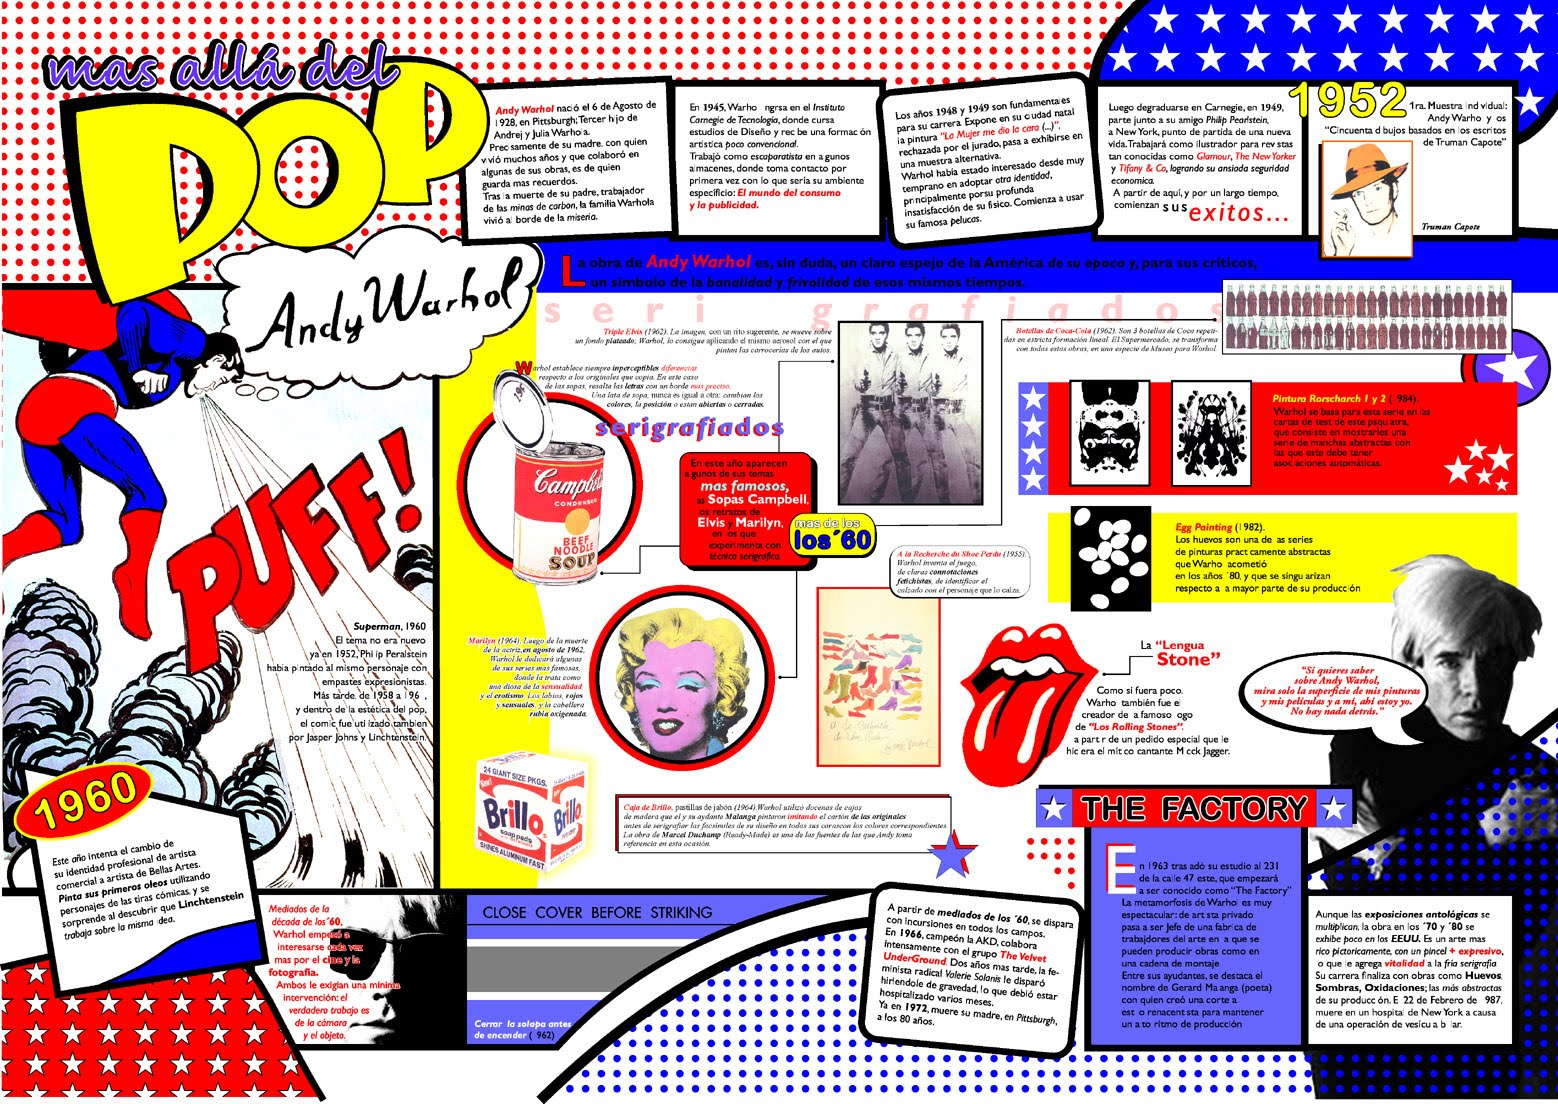 Warhol Pop Art And Andy Warhol